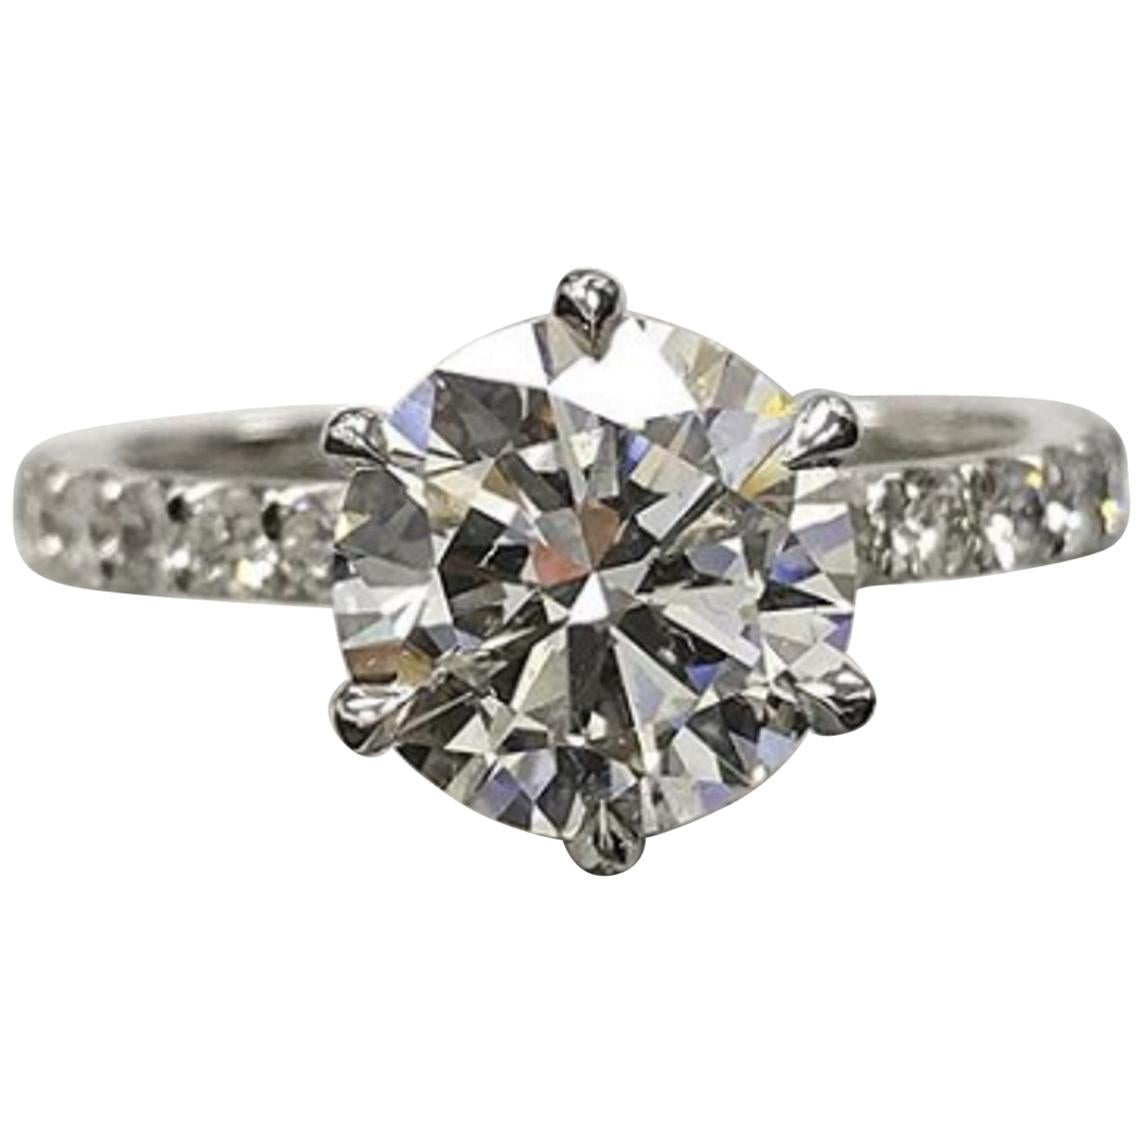 GIA Certified 2 Carat Triple Excellent Round Brilliant Cut Diamond VS1 Clarity